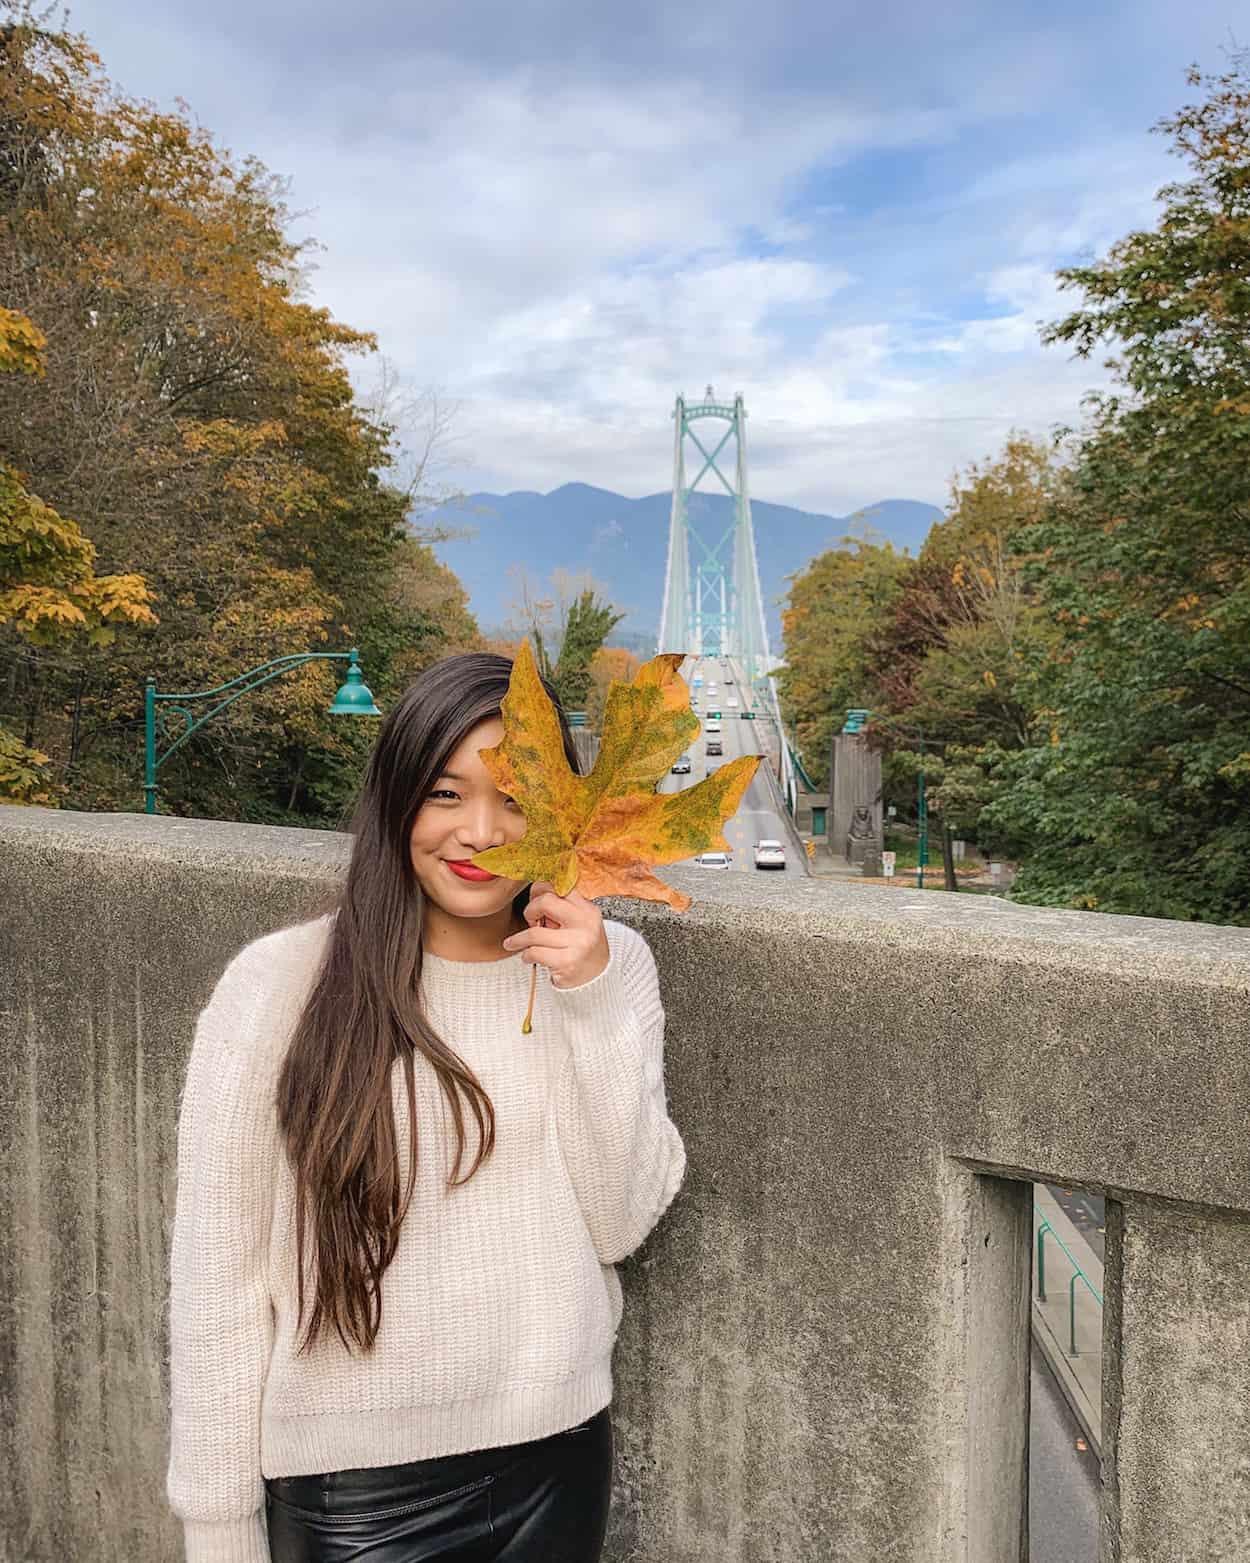 The Lion's Gate Bridge in Stanley Park, Vancouver